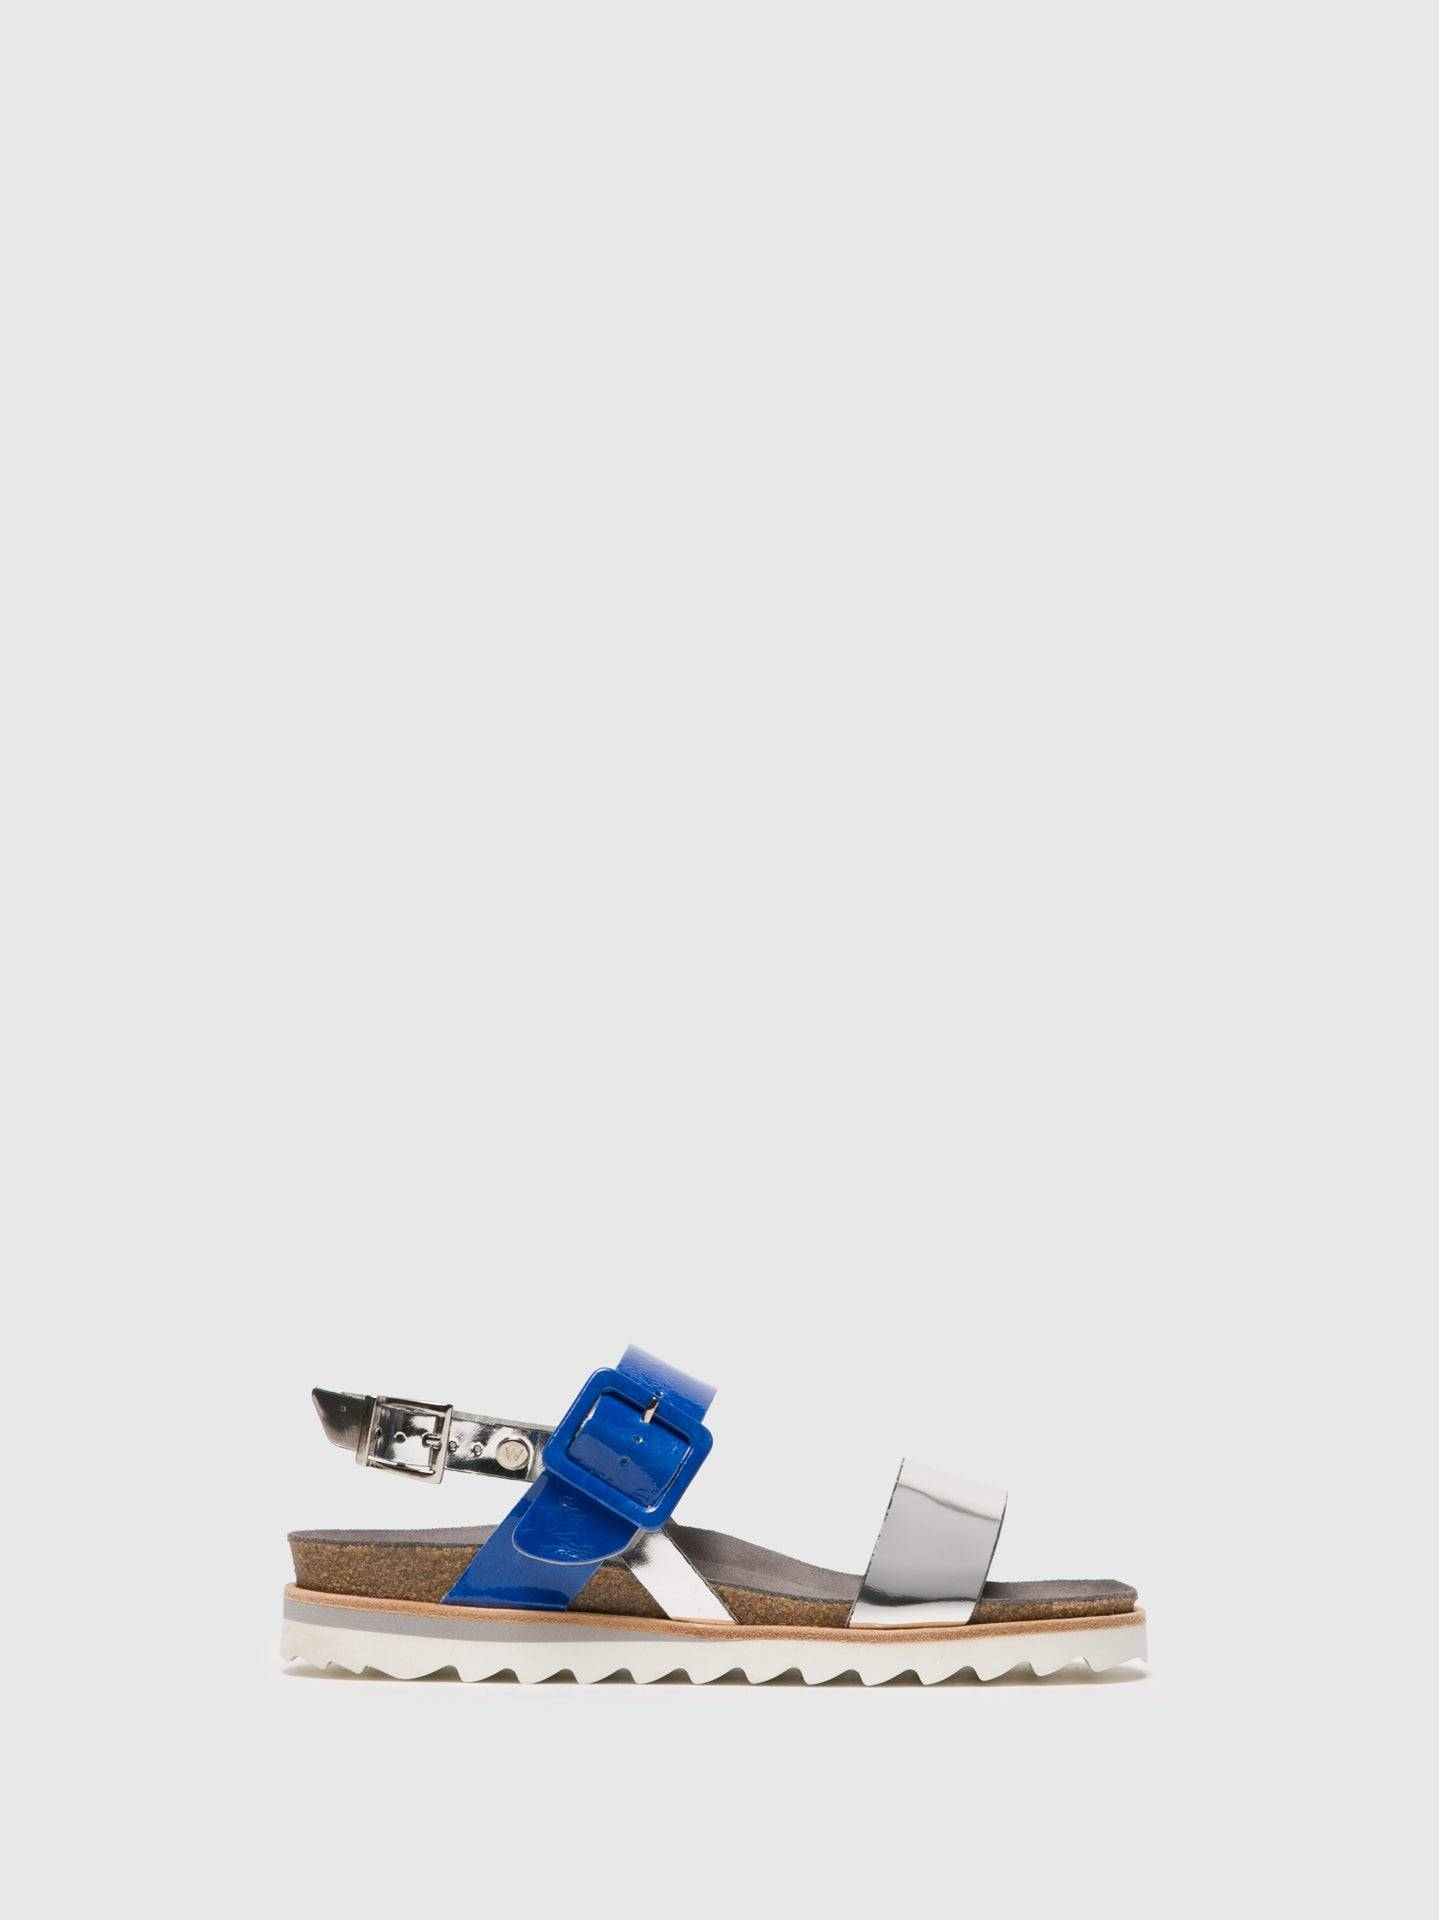 Wolky Sandalen mit Schnalle in Mehrfarbig - Overcube